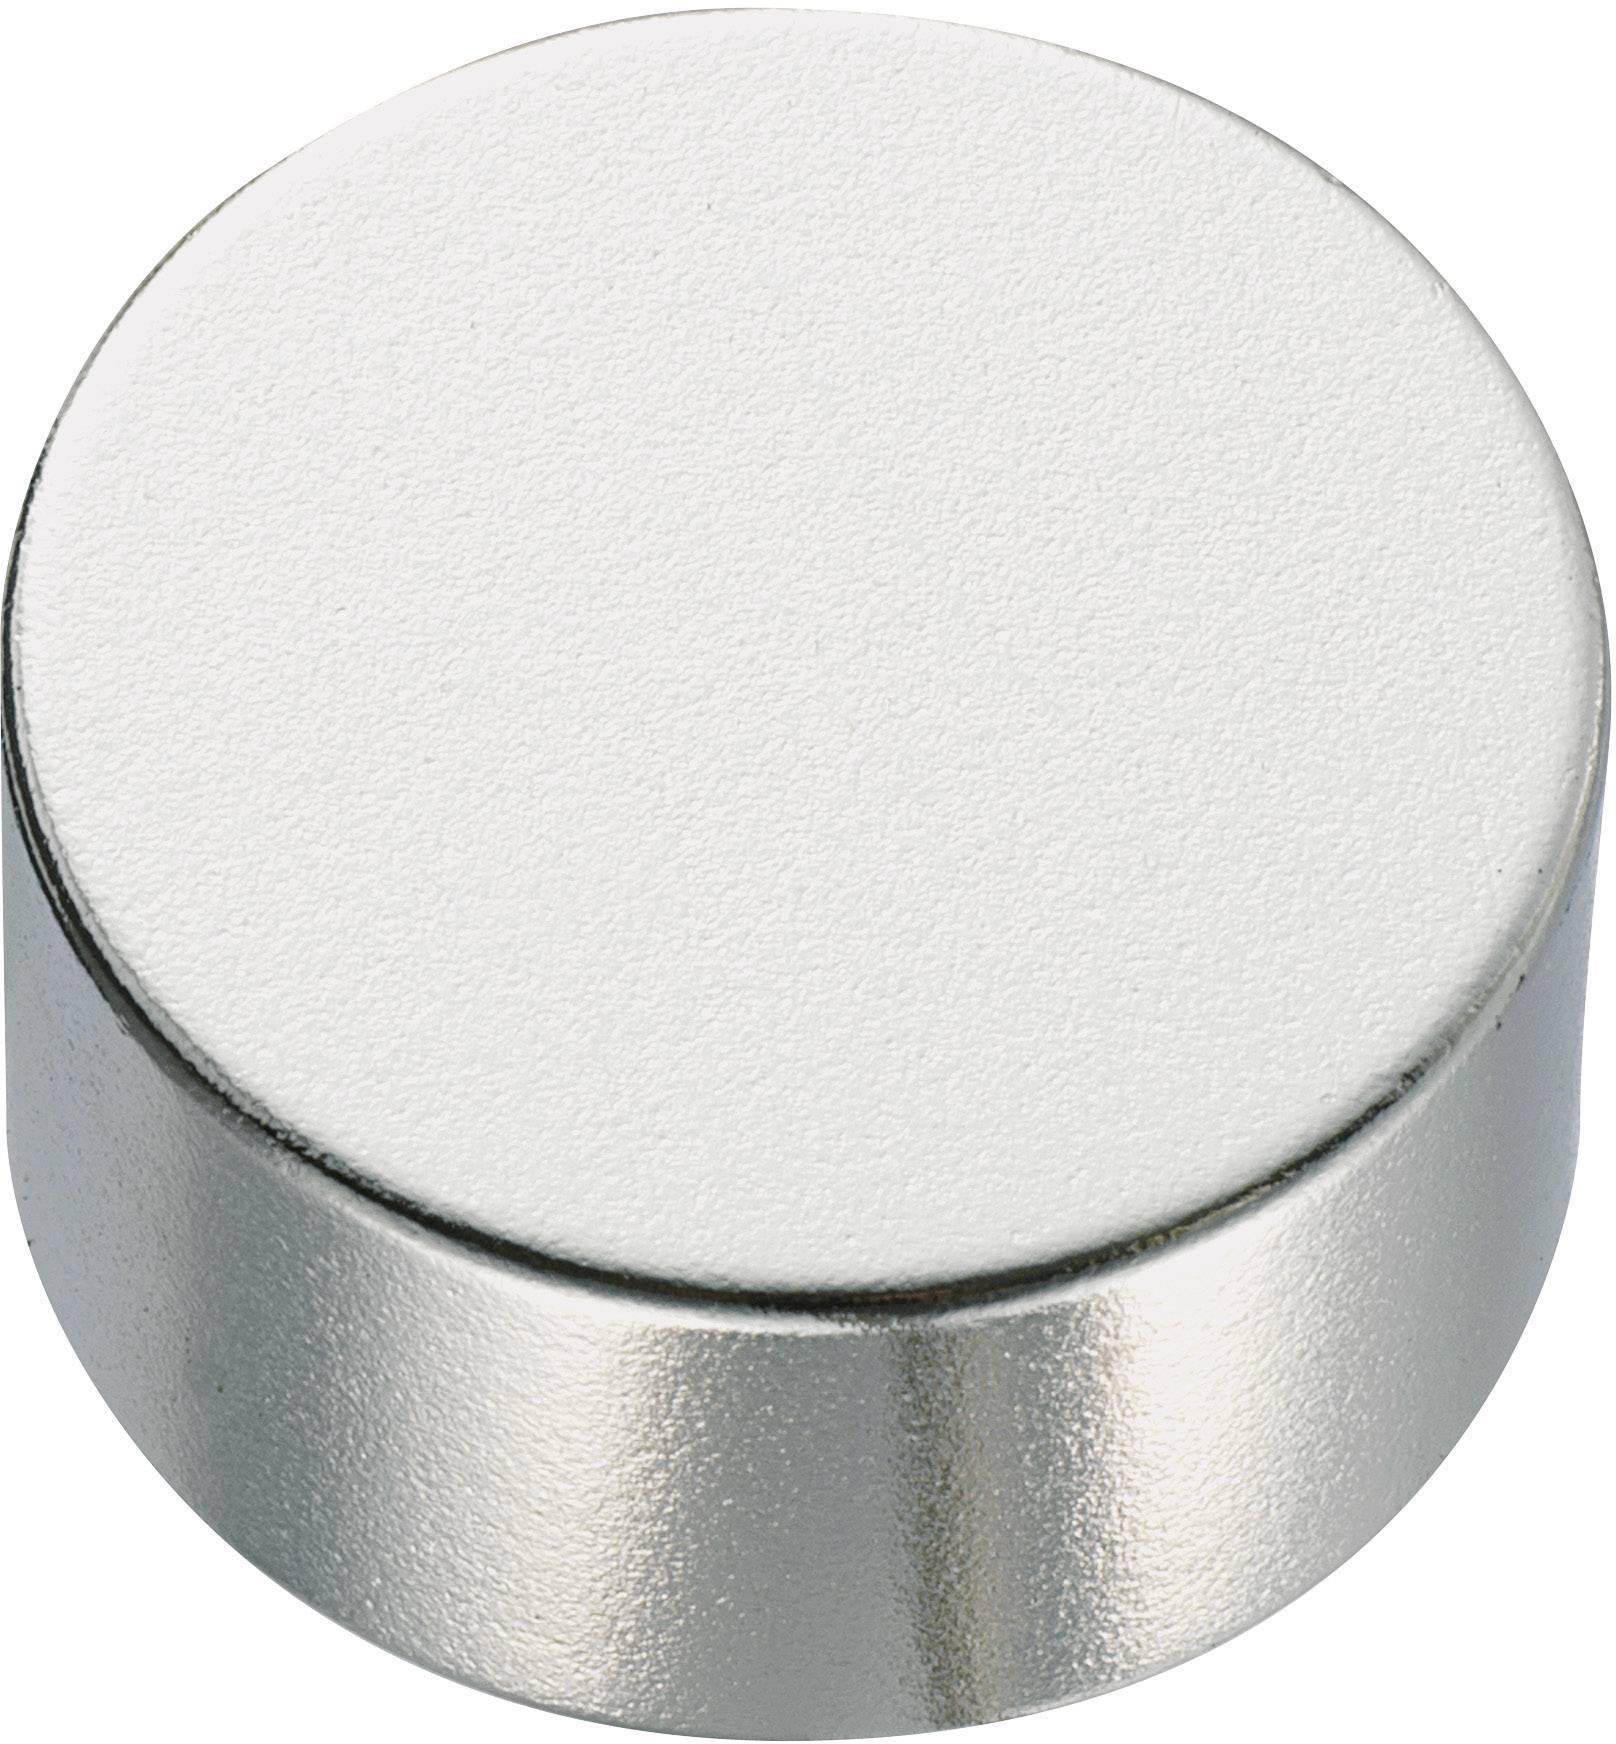 Permanentný magnet, N45, 10 x 2 mm, valcový